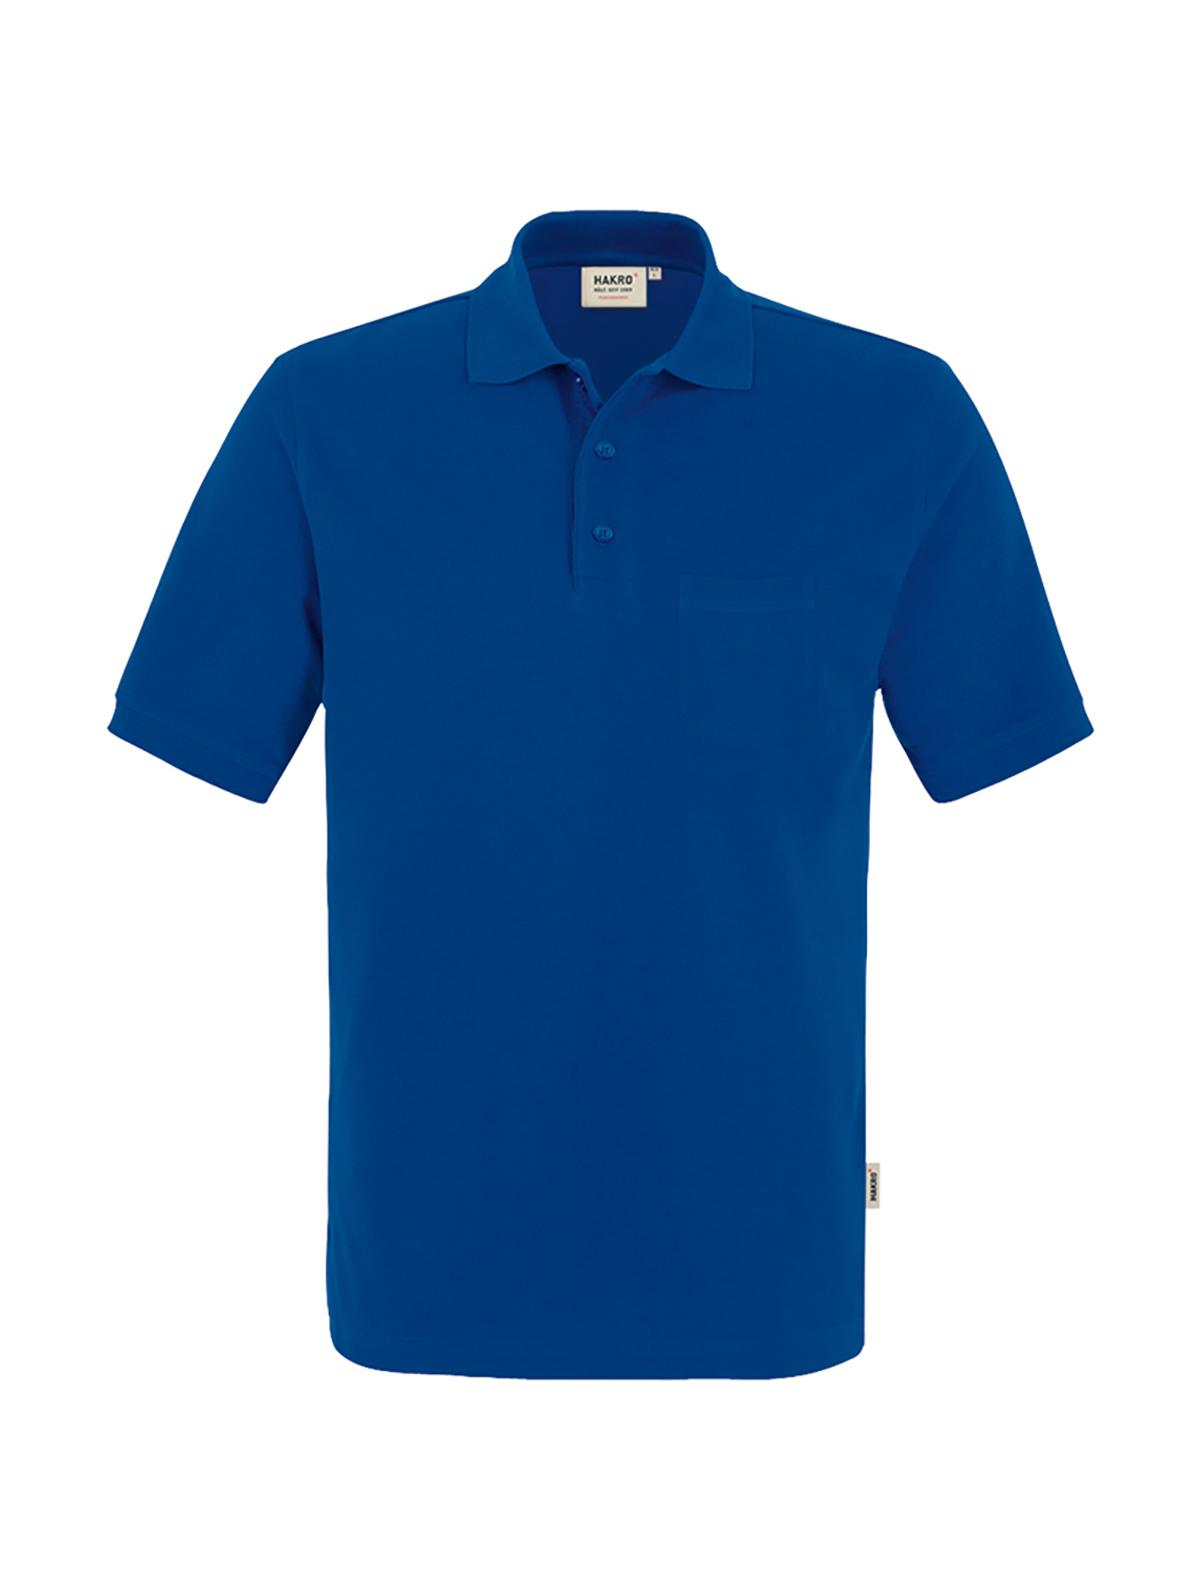 Pocket-Poloshirt Performance